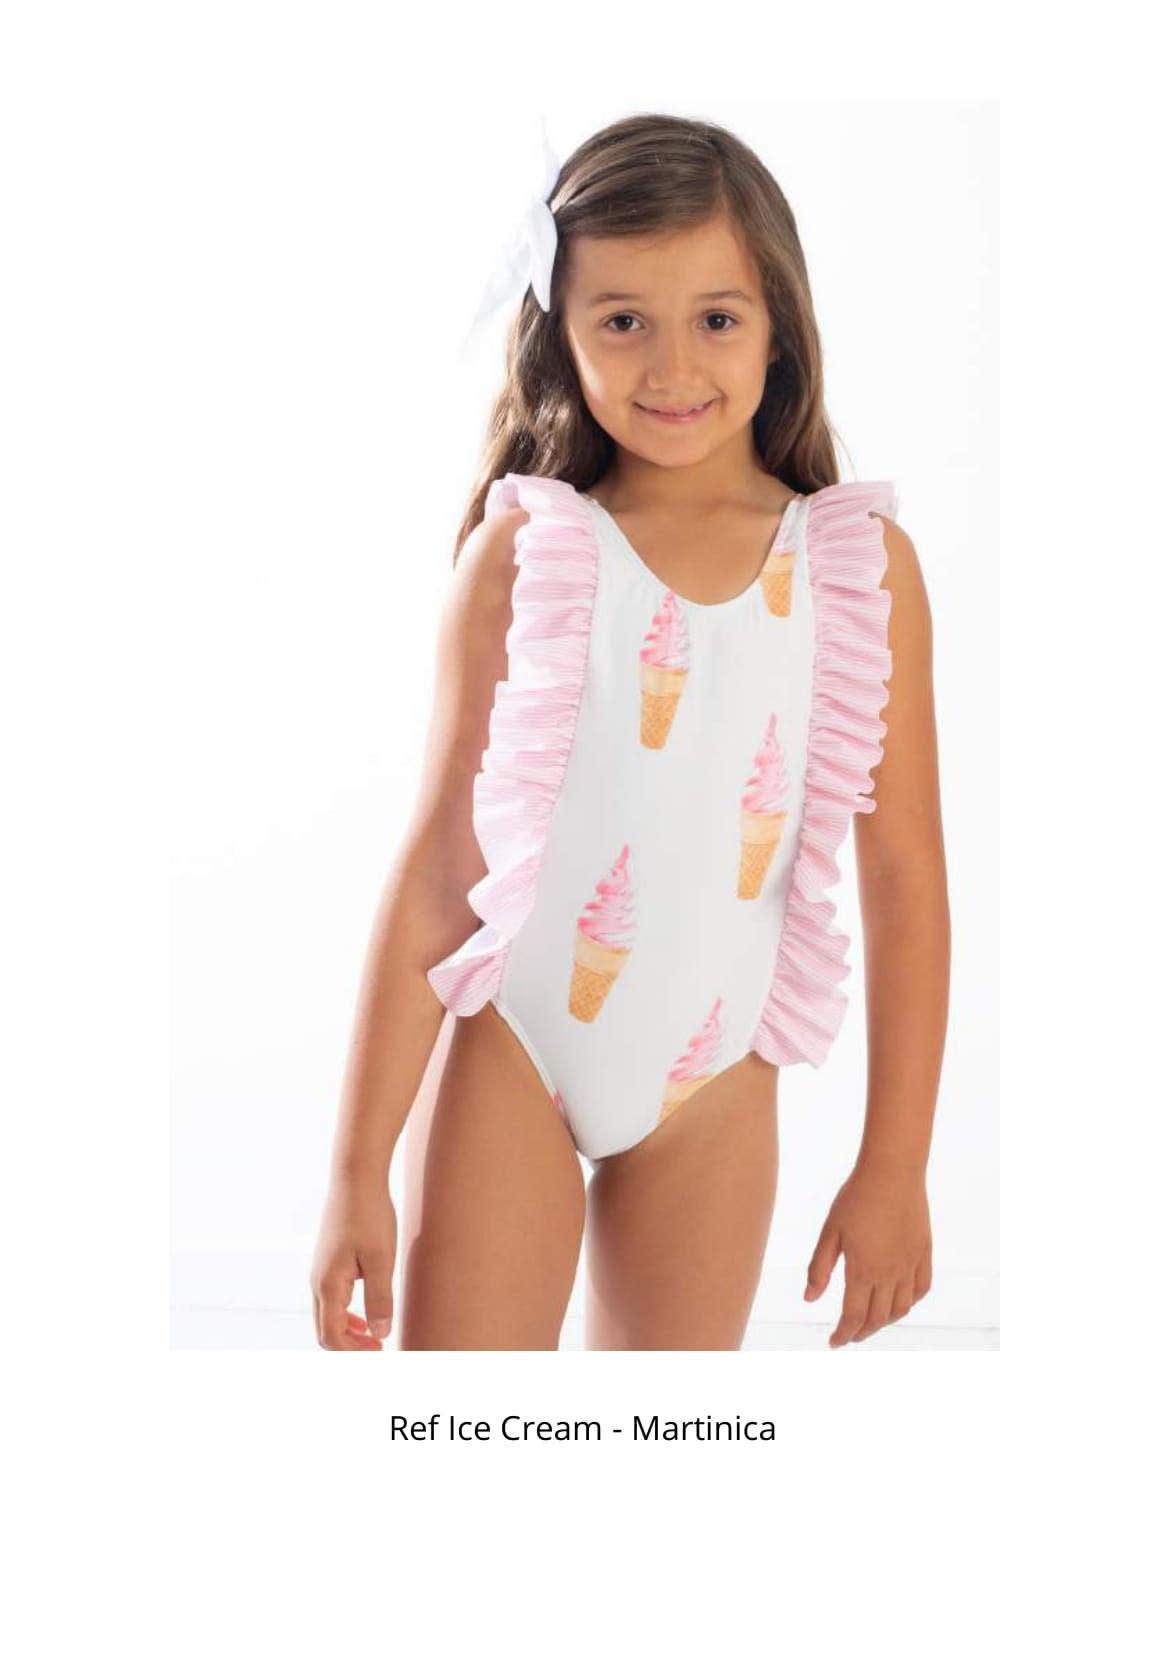 Meia Pata Meia Pata Martinica Ice-Cream Swimsuit 2-4YRS